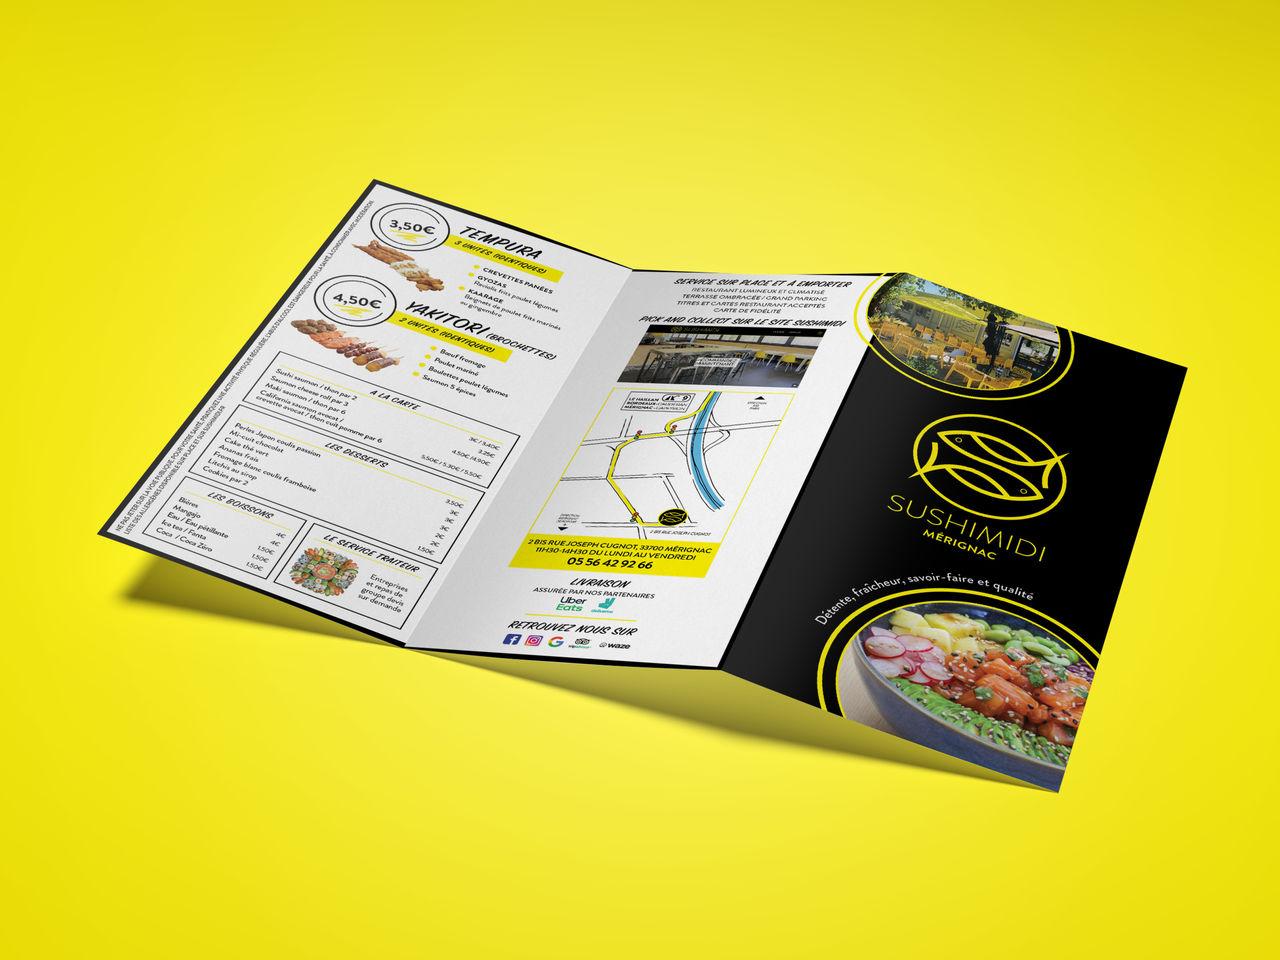 SUSHIMIDI - Restaurant de sushis